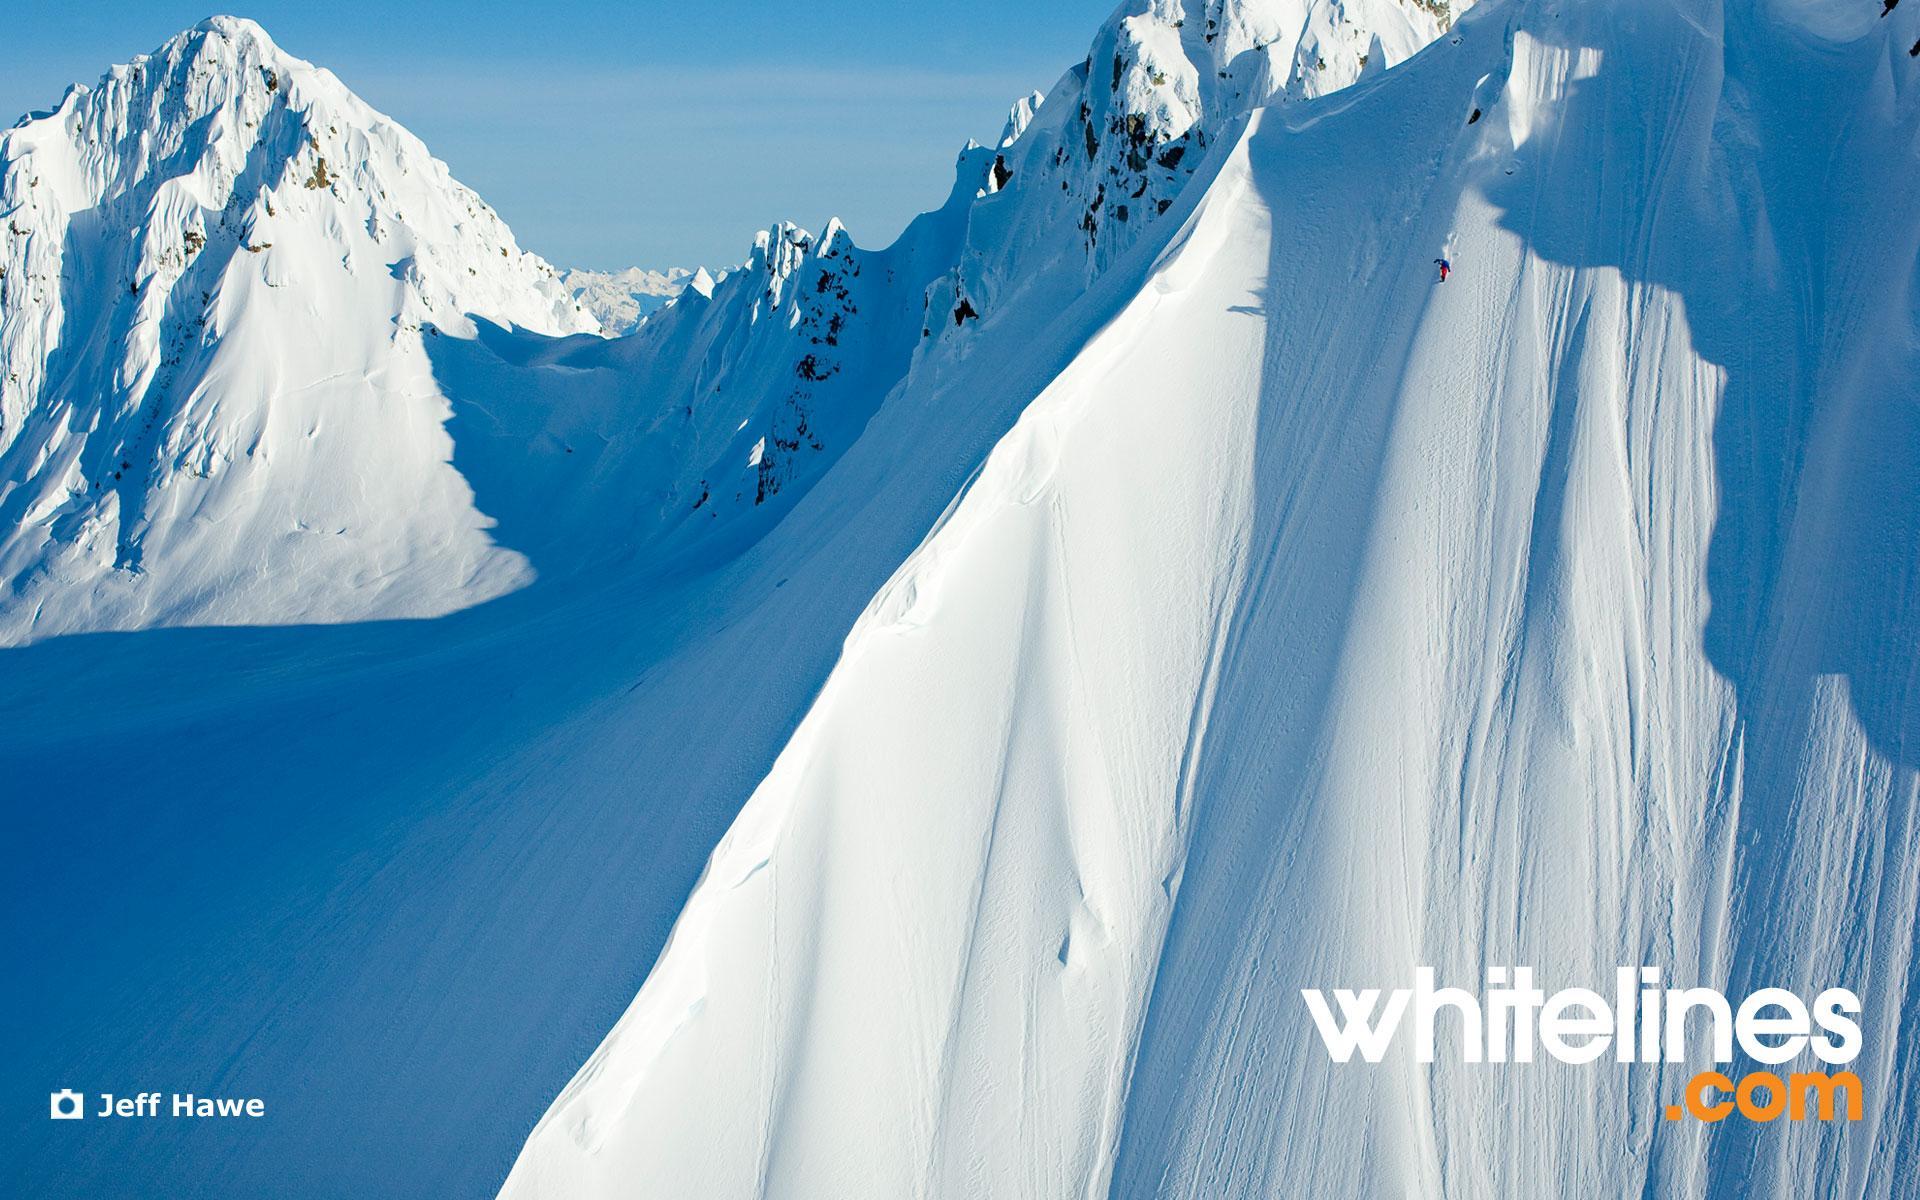 Résultats Google Recherche d'images correspondant à http://cdn1.static.mporatrons.com/site/whitelines/wp-content/uploads/2011/06/Snowboard-Wallpaper-DCP-Alaska-1920x1200.jpg